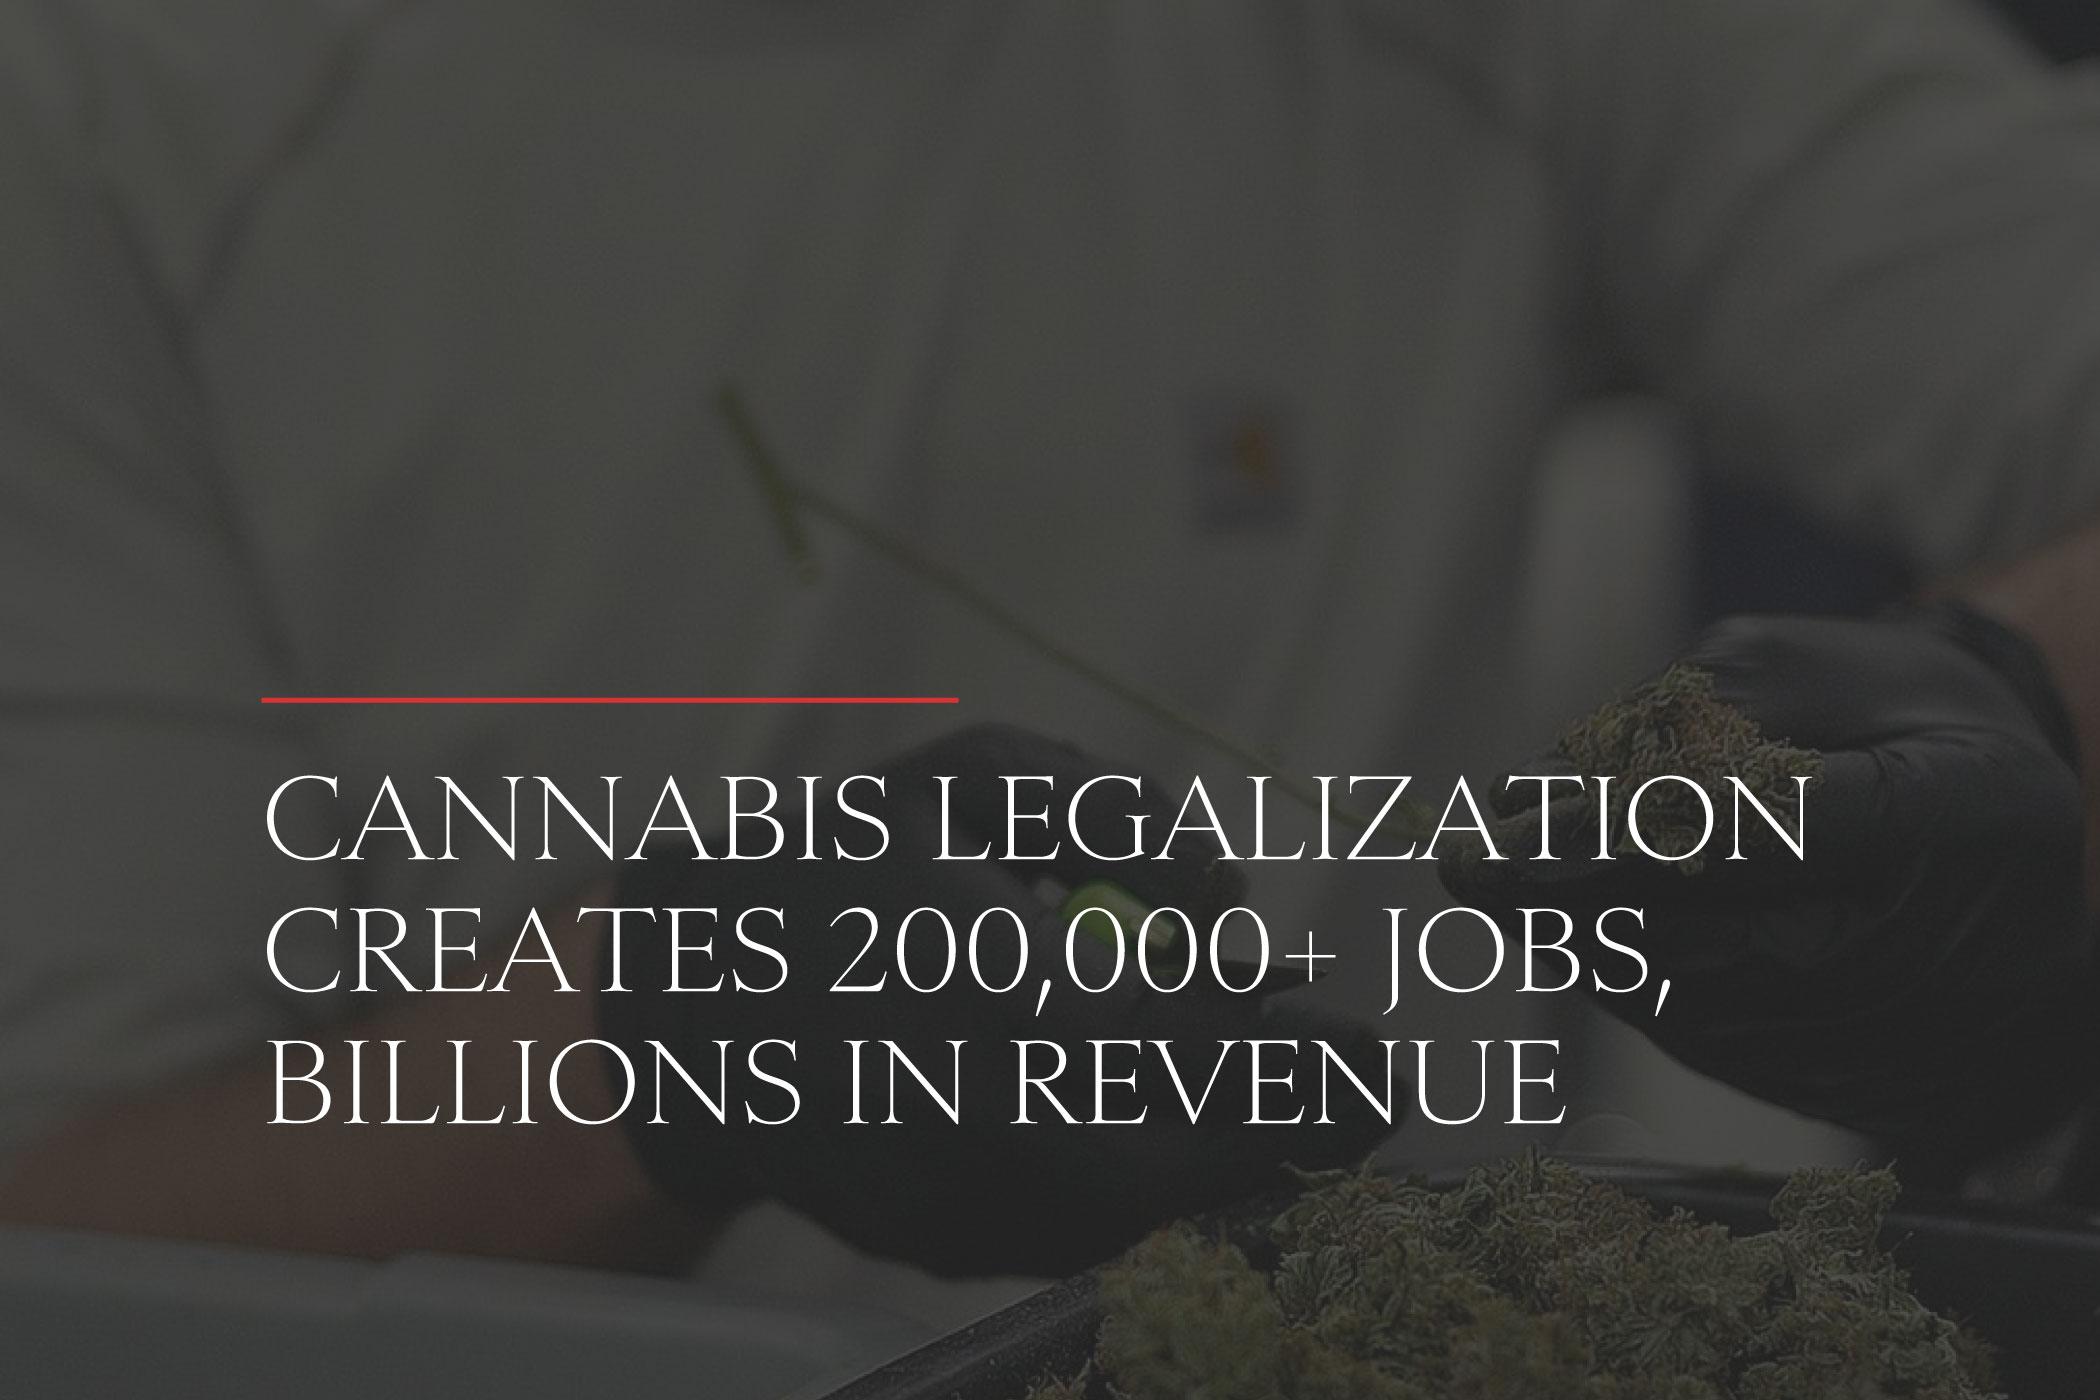 cannabis legalization creates 200,000 jobs and billions in revenue